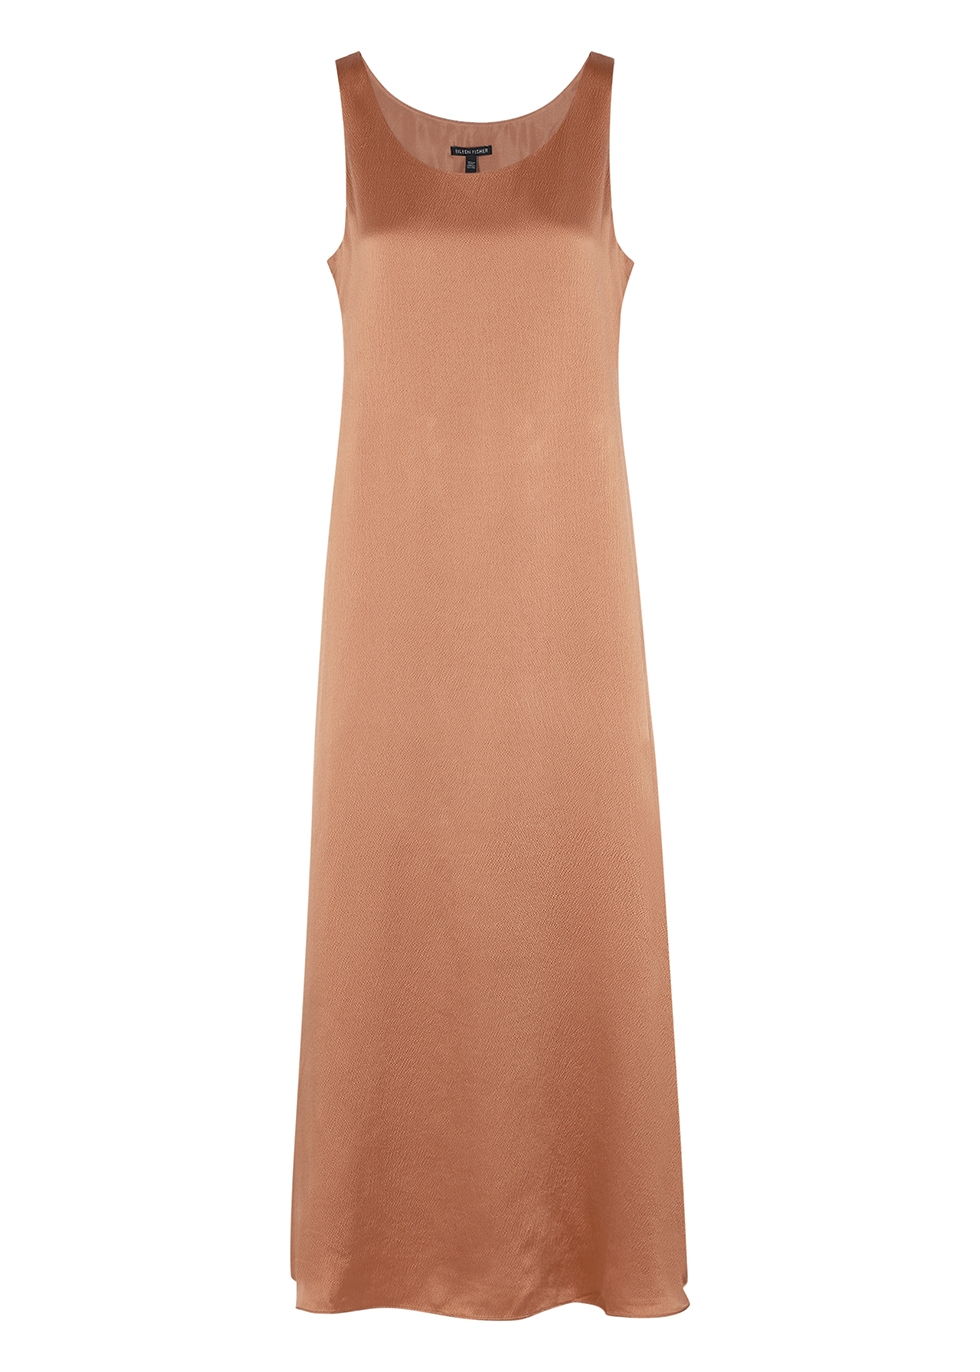 Dusky rose silk maxi dress